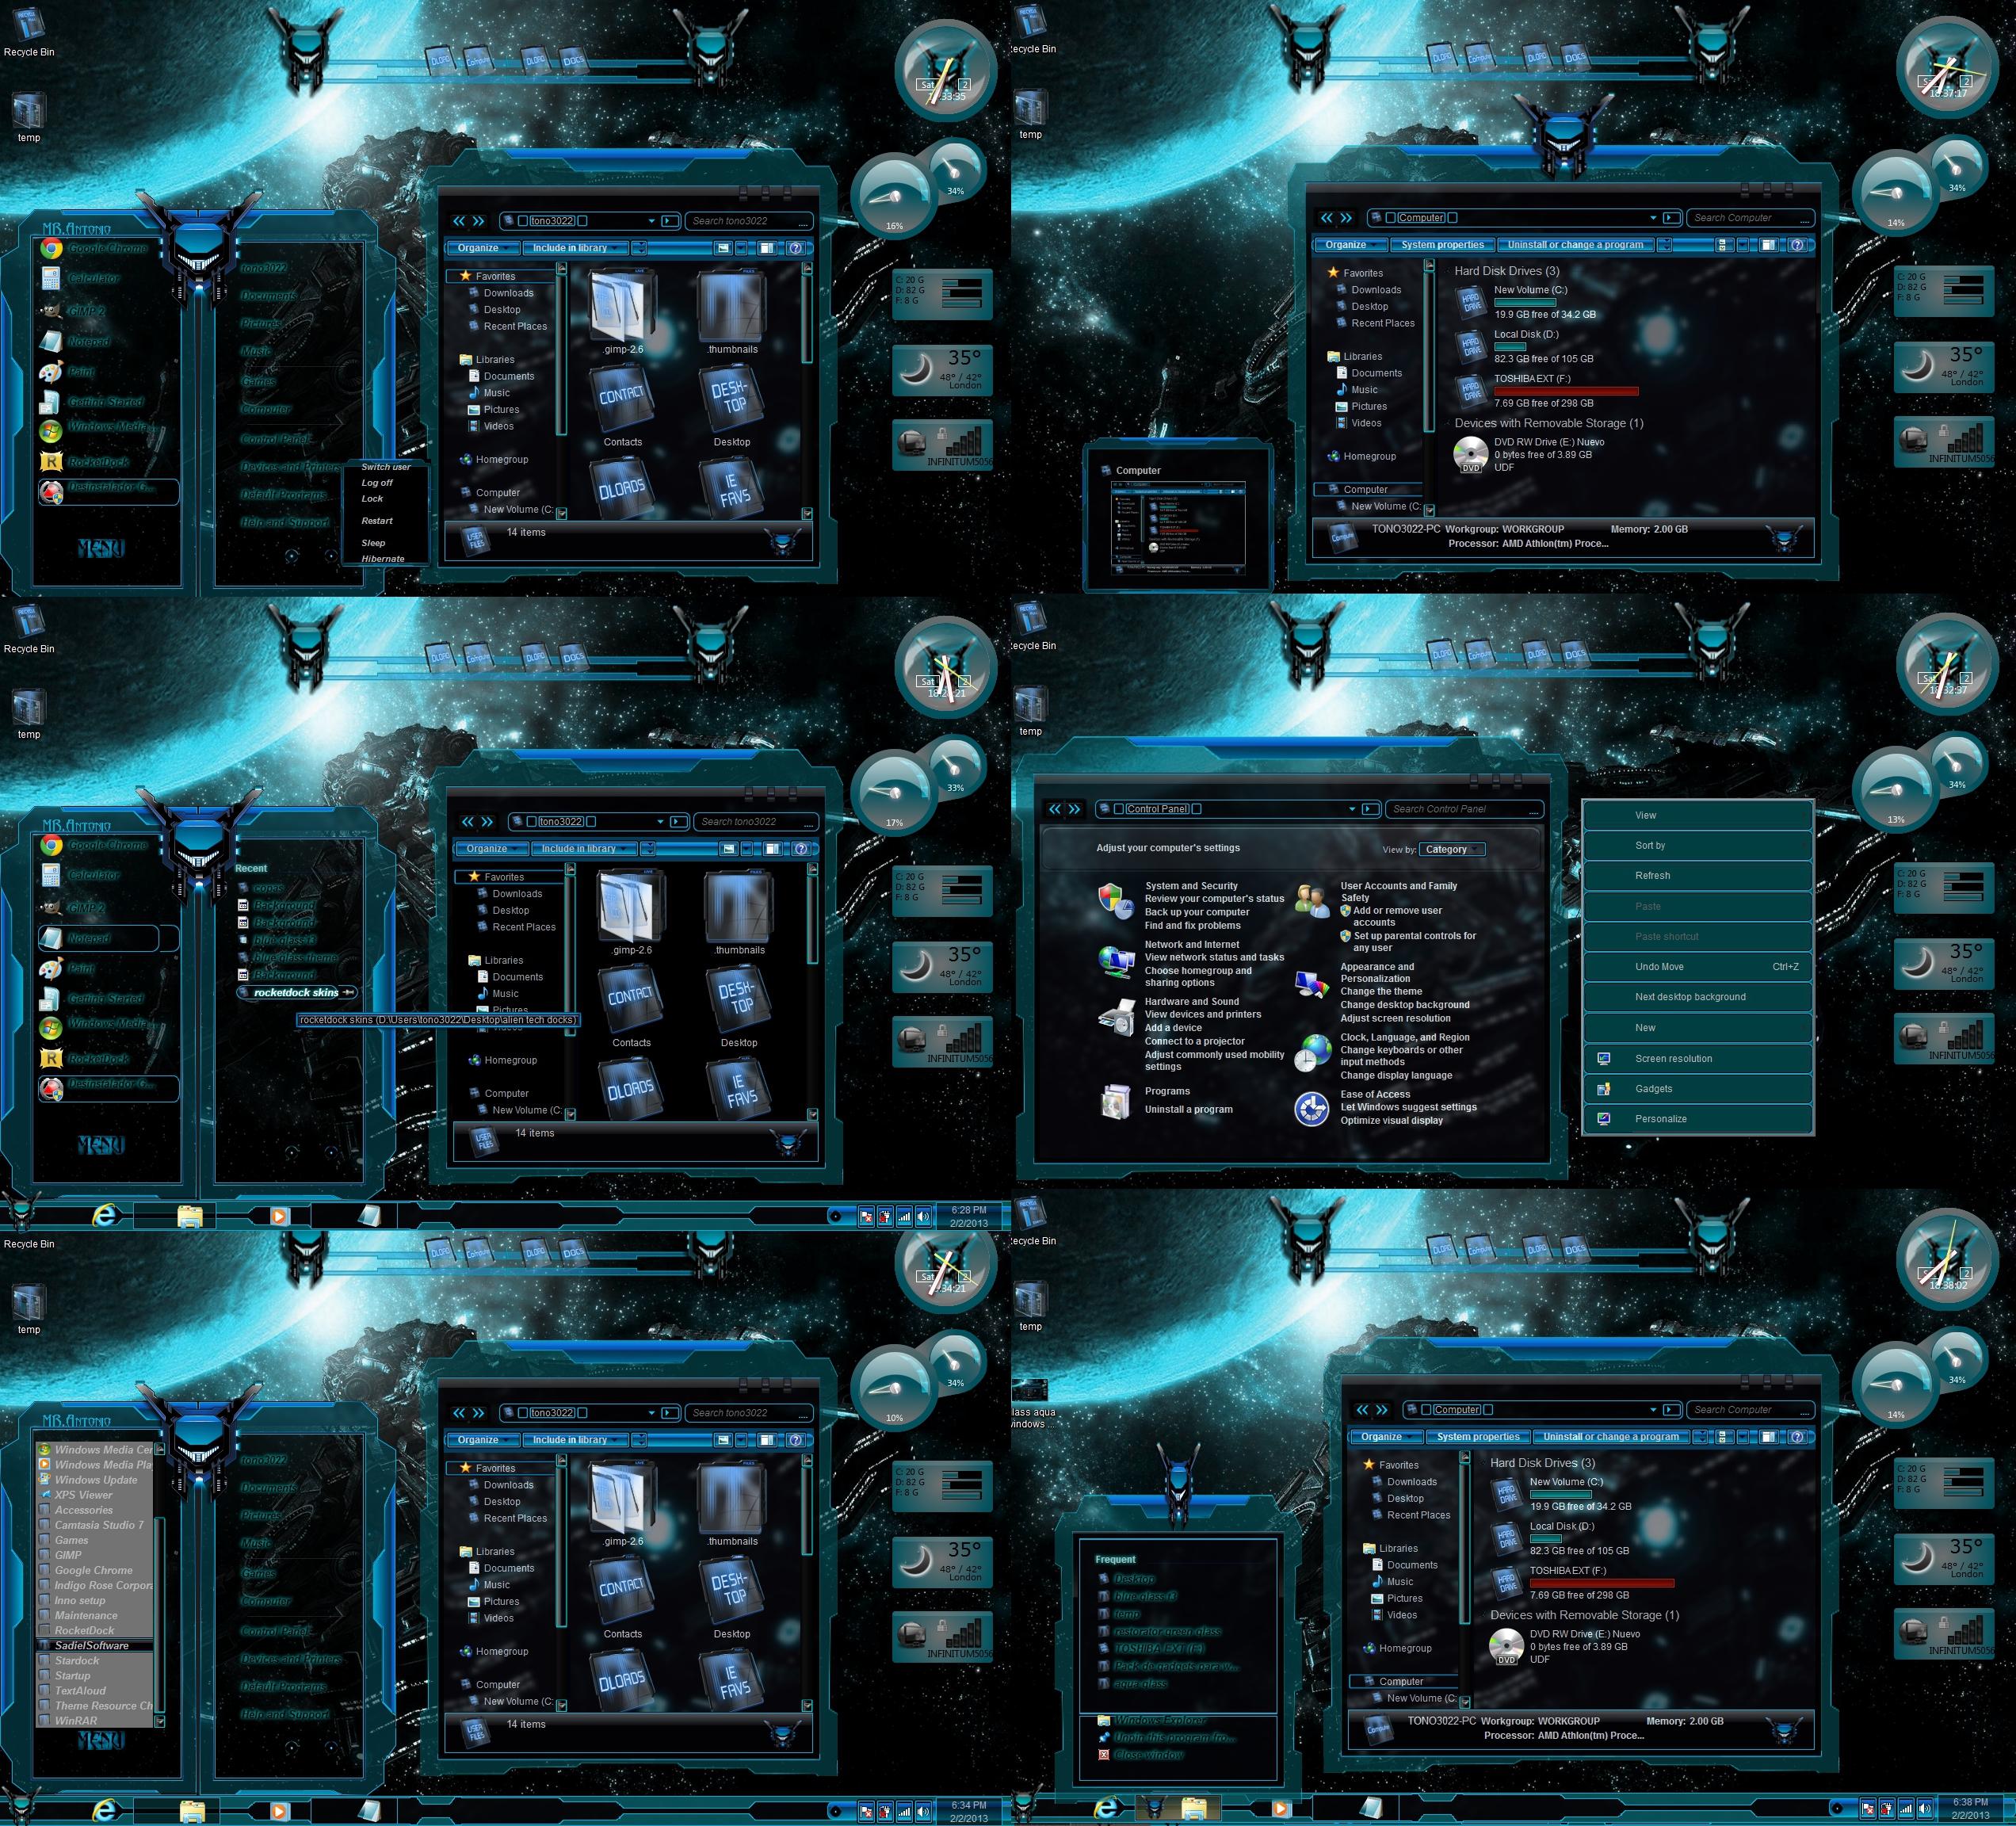 Aqua glass windows 7 themes by tono3022 on deviantart for Window 07 themes